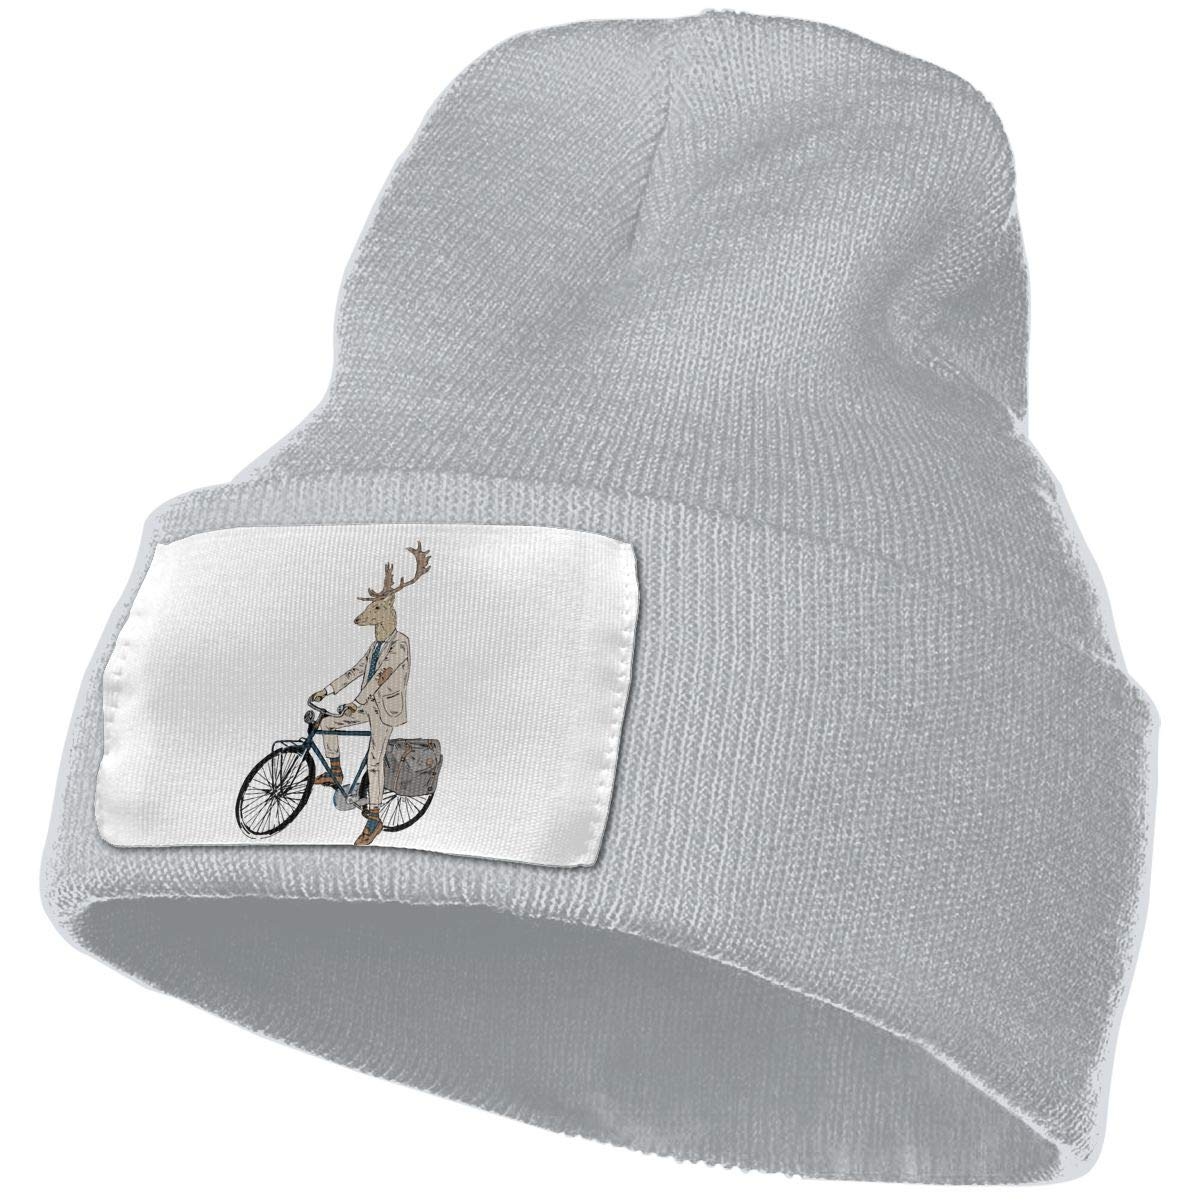 Adults Deer Riding A Bike Elastic Knitted Beanie Cap Winter Warm Skull Hats